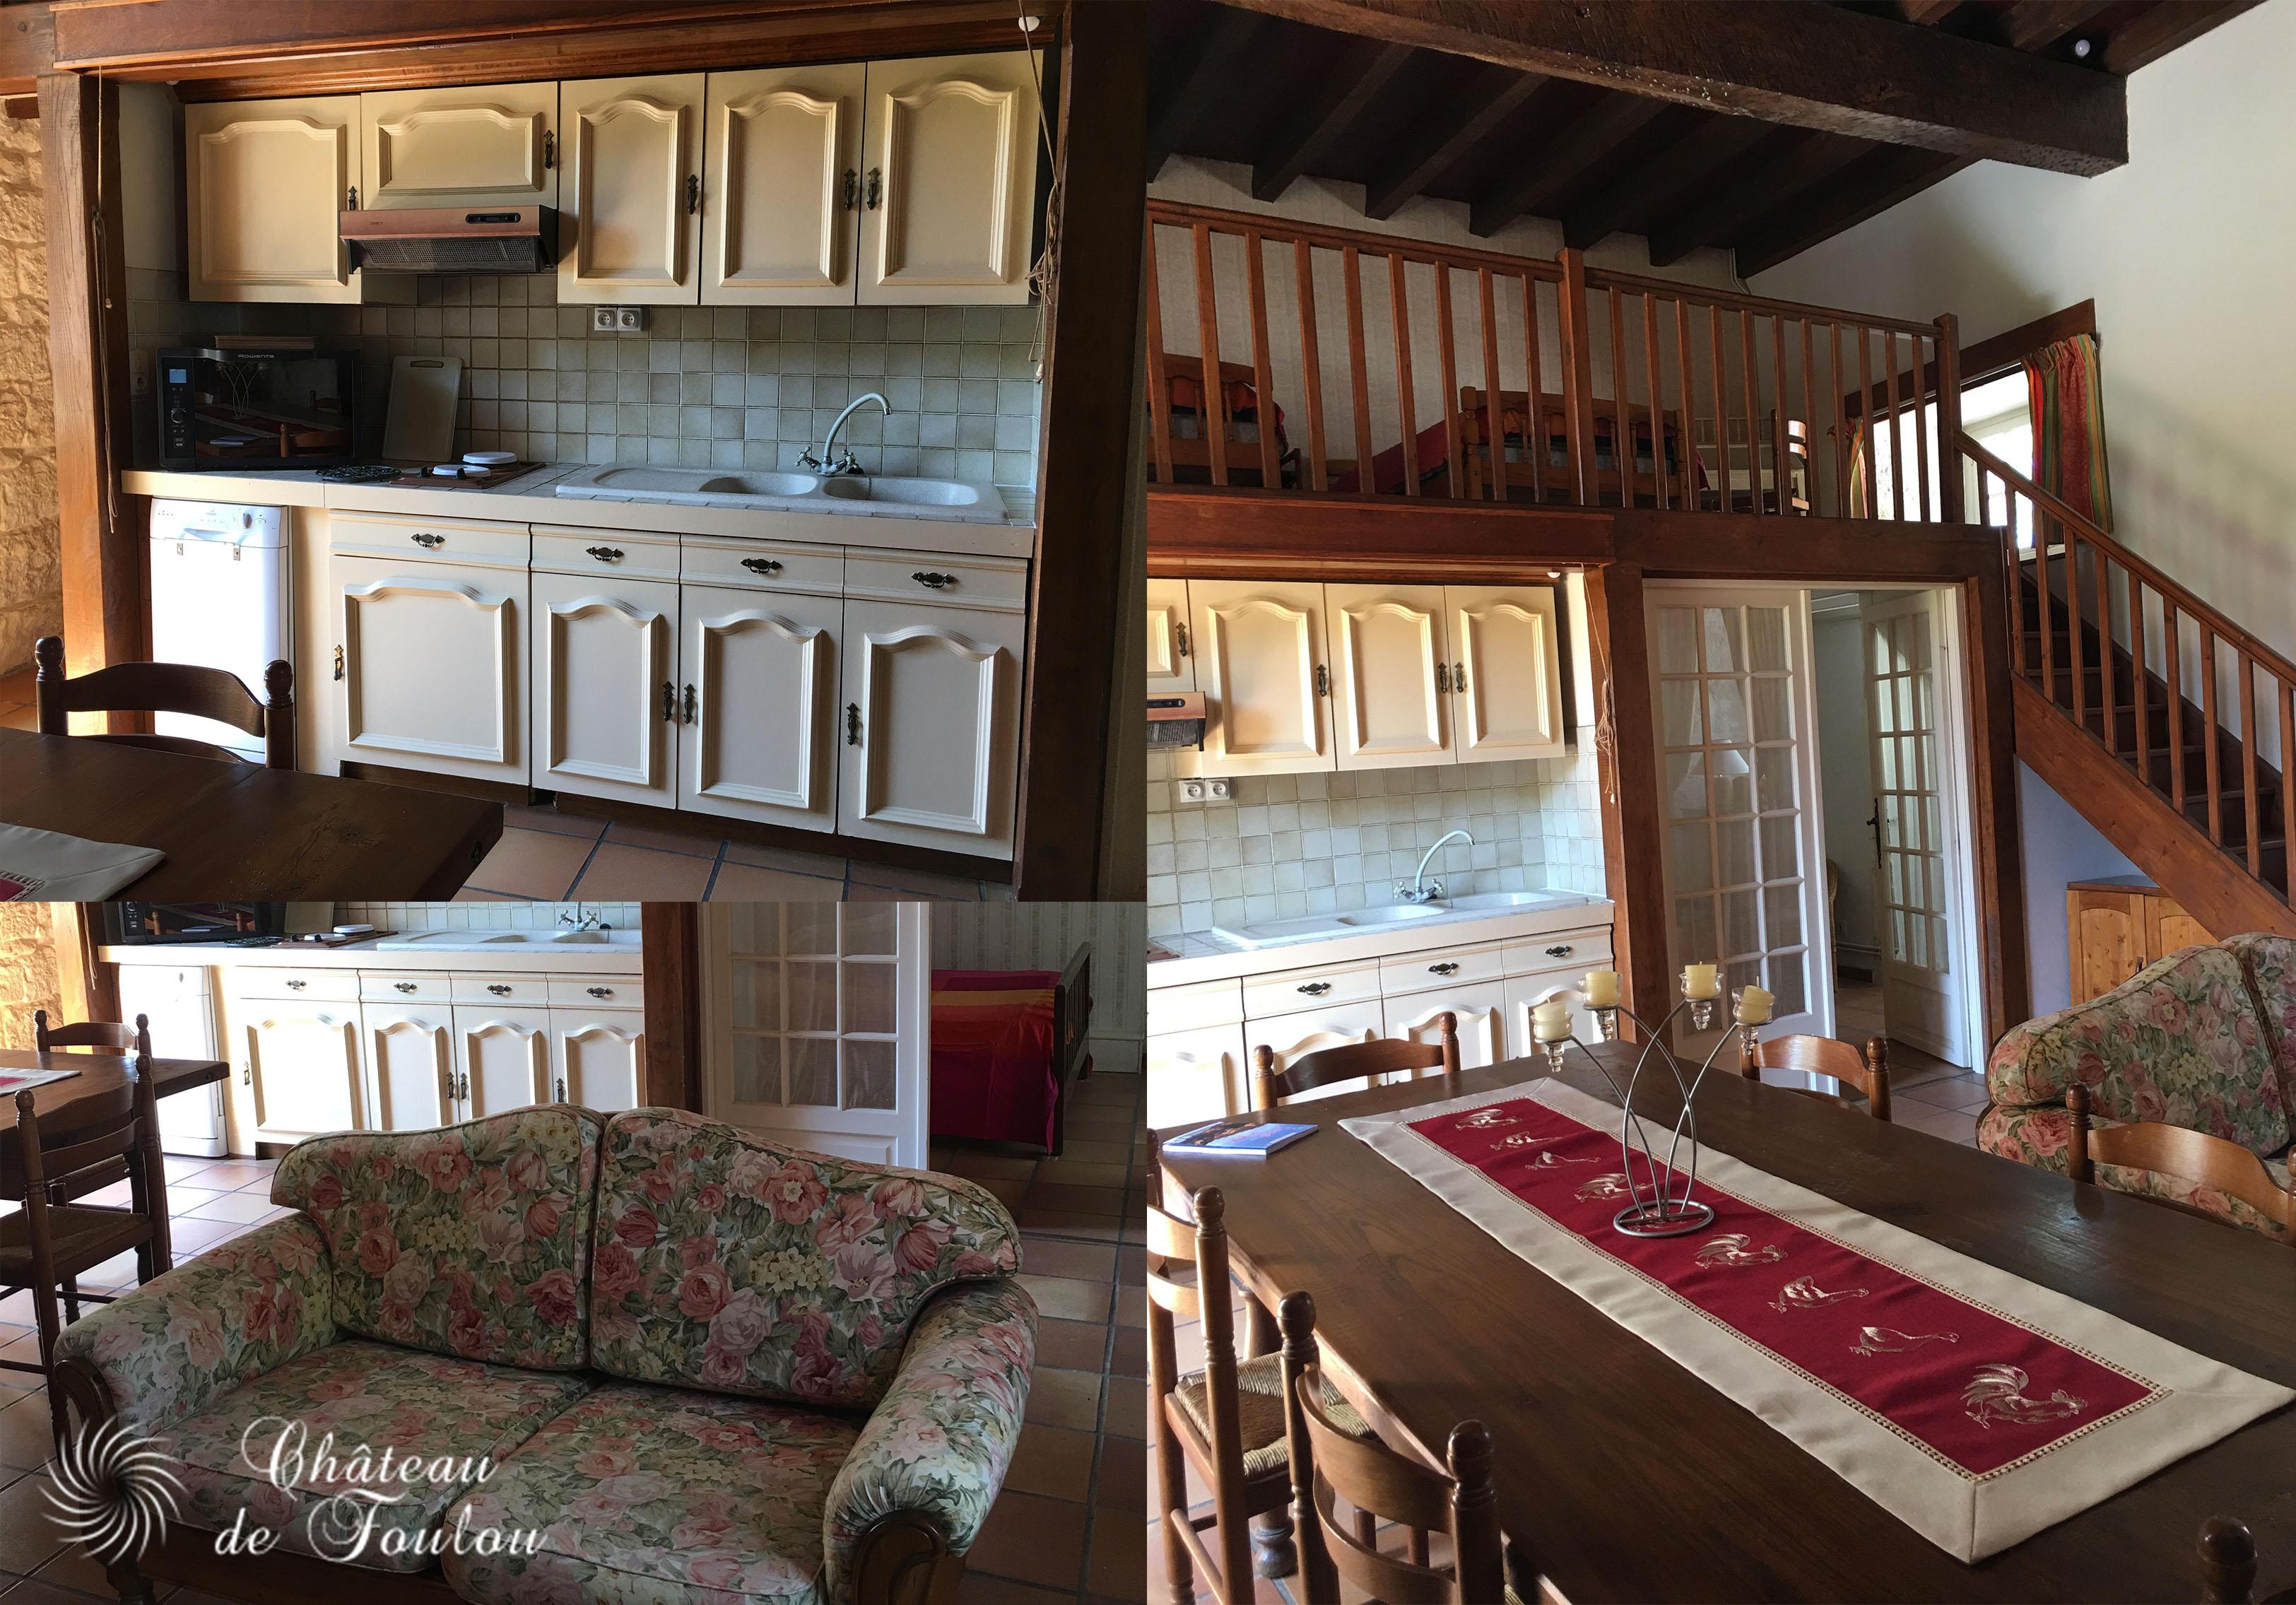 http://www.chateau-de-foulou.com/wp-content/uploads/2019/08/kitchen-foulou.jpg